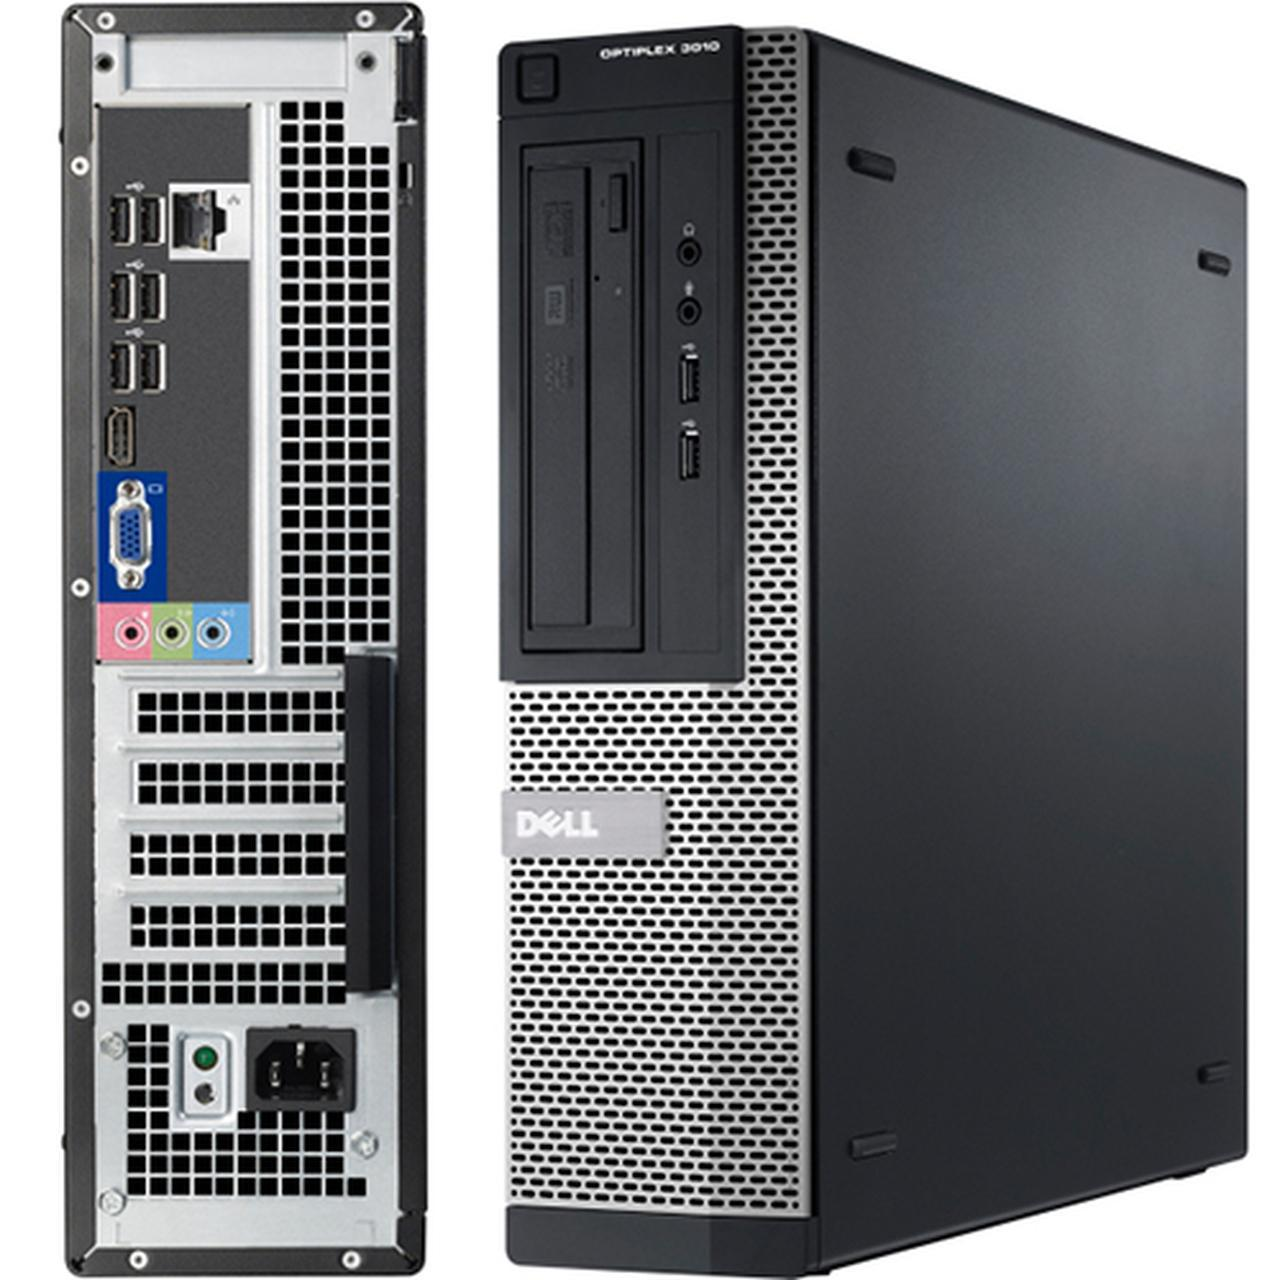 Dell OptiPlex 3010 SFF Core i3-3220 3,3 - HDD 250 GB - 4GB